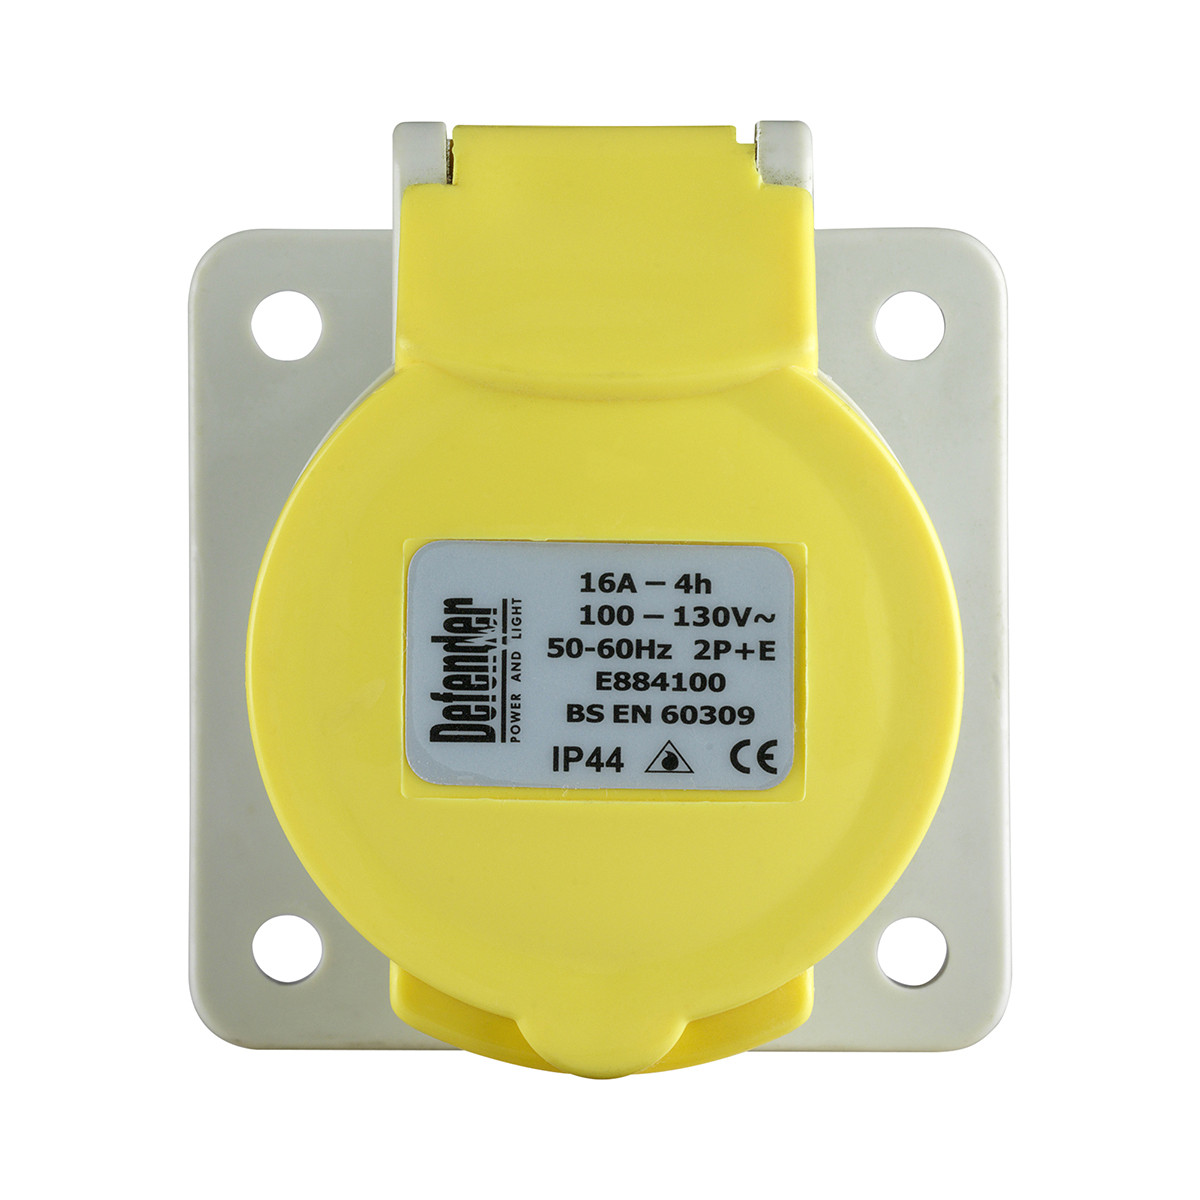 16A 110V Panel Socket IP44